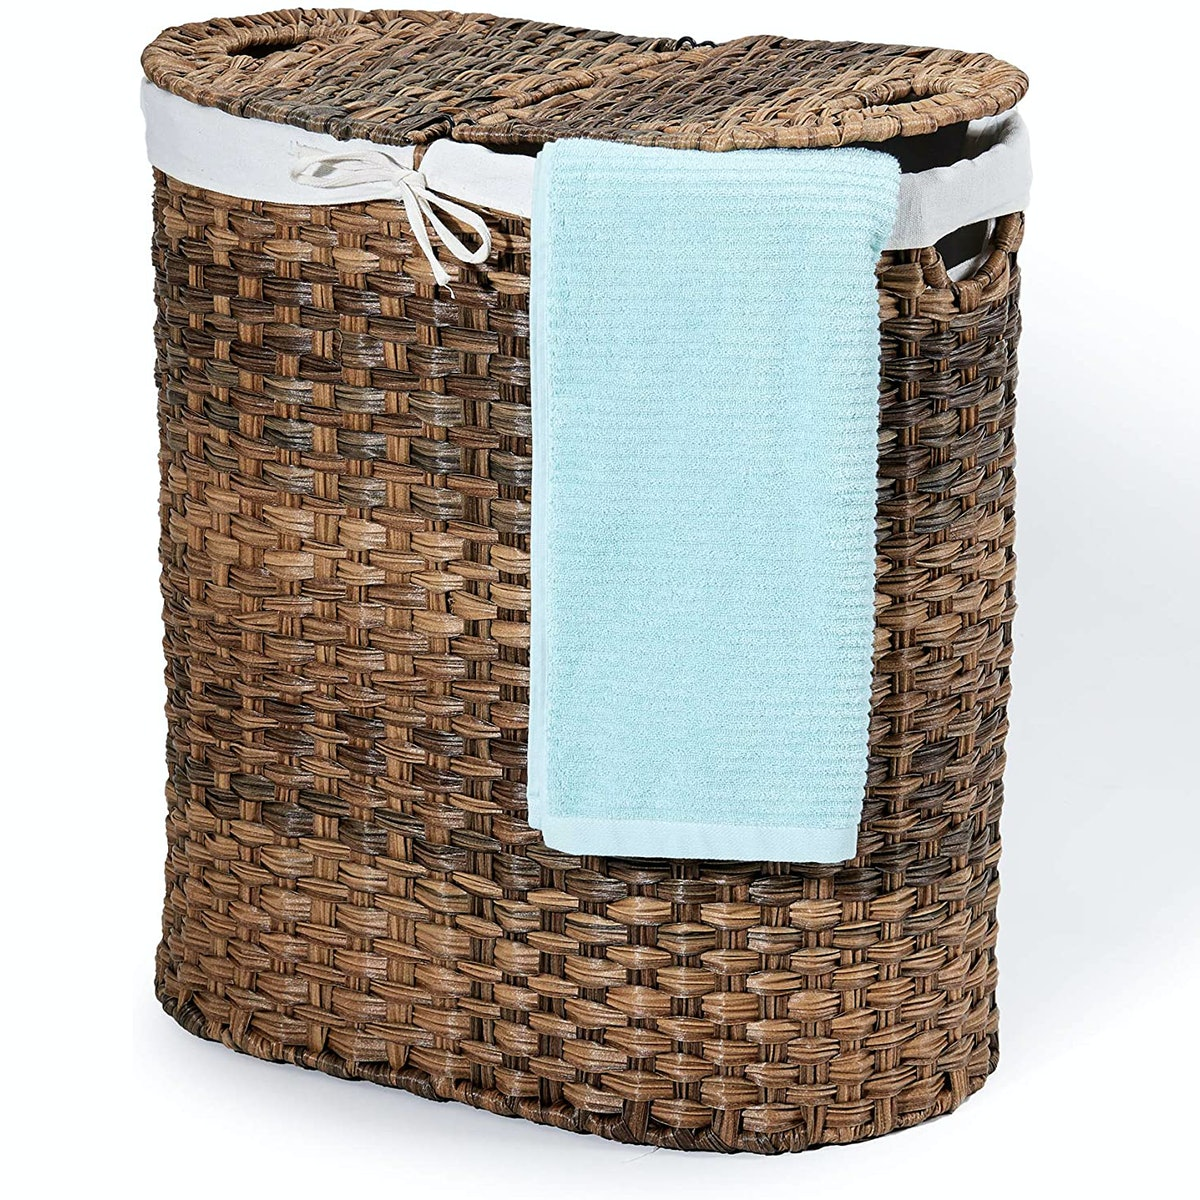 Seville Classics Hand-Woven Oval Laundry Sorter